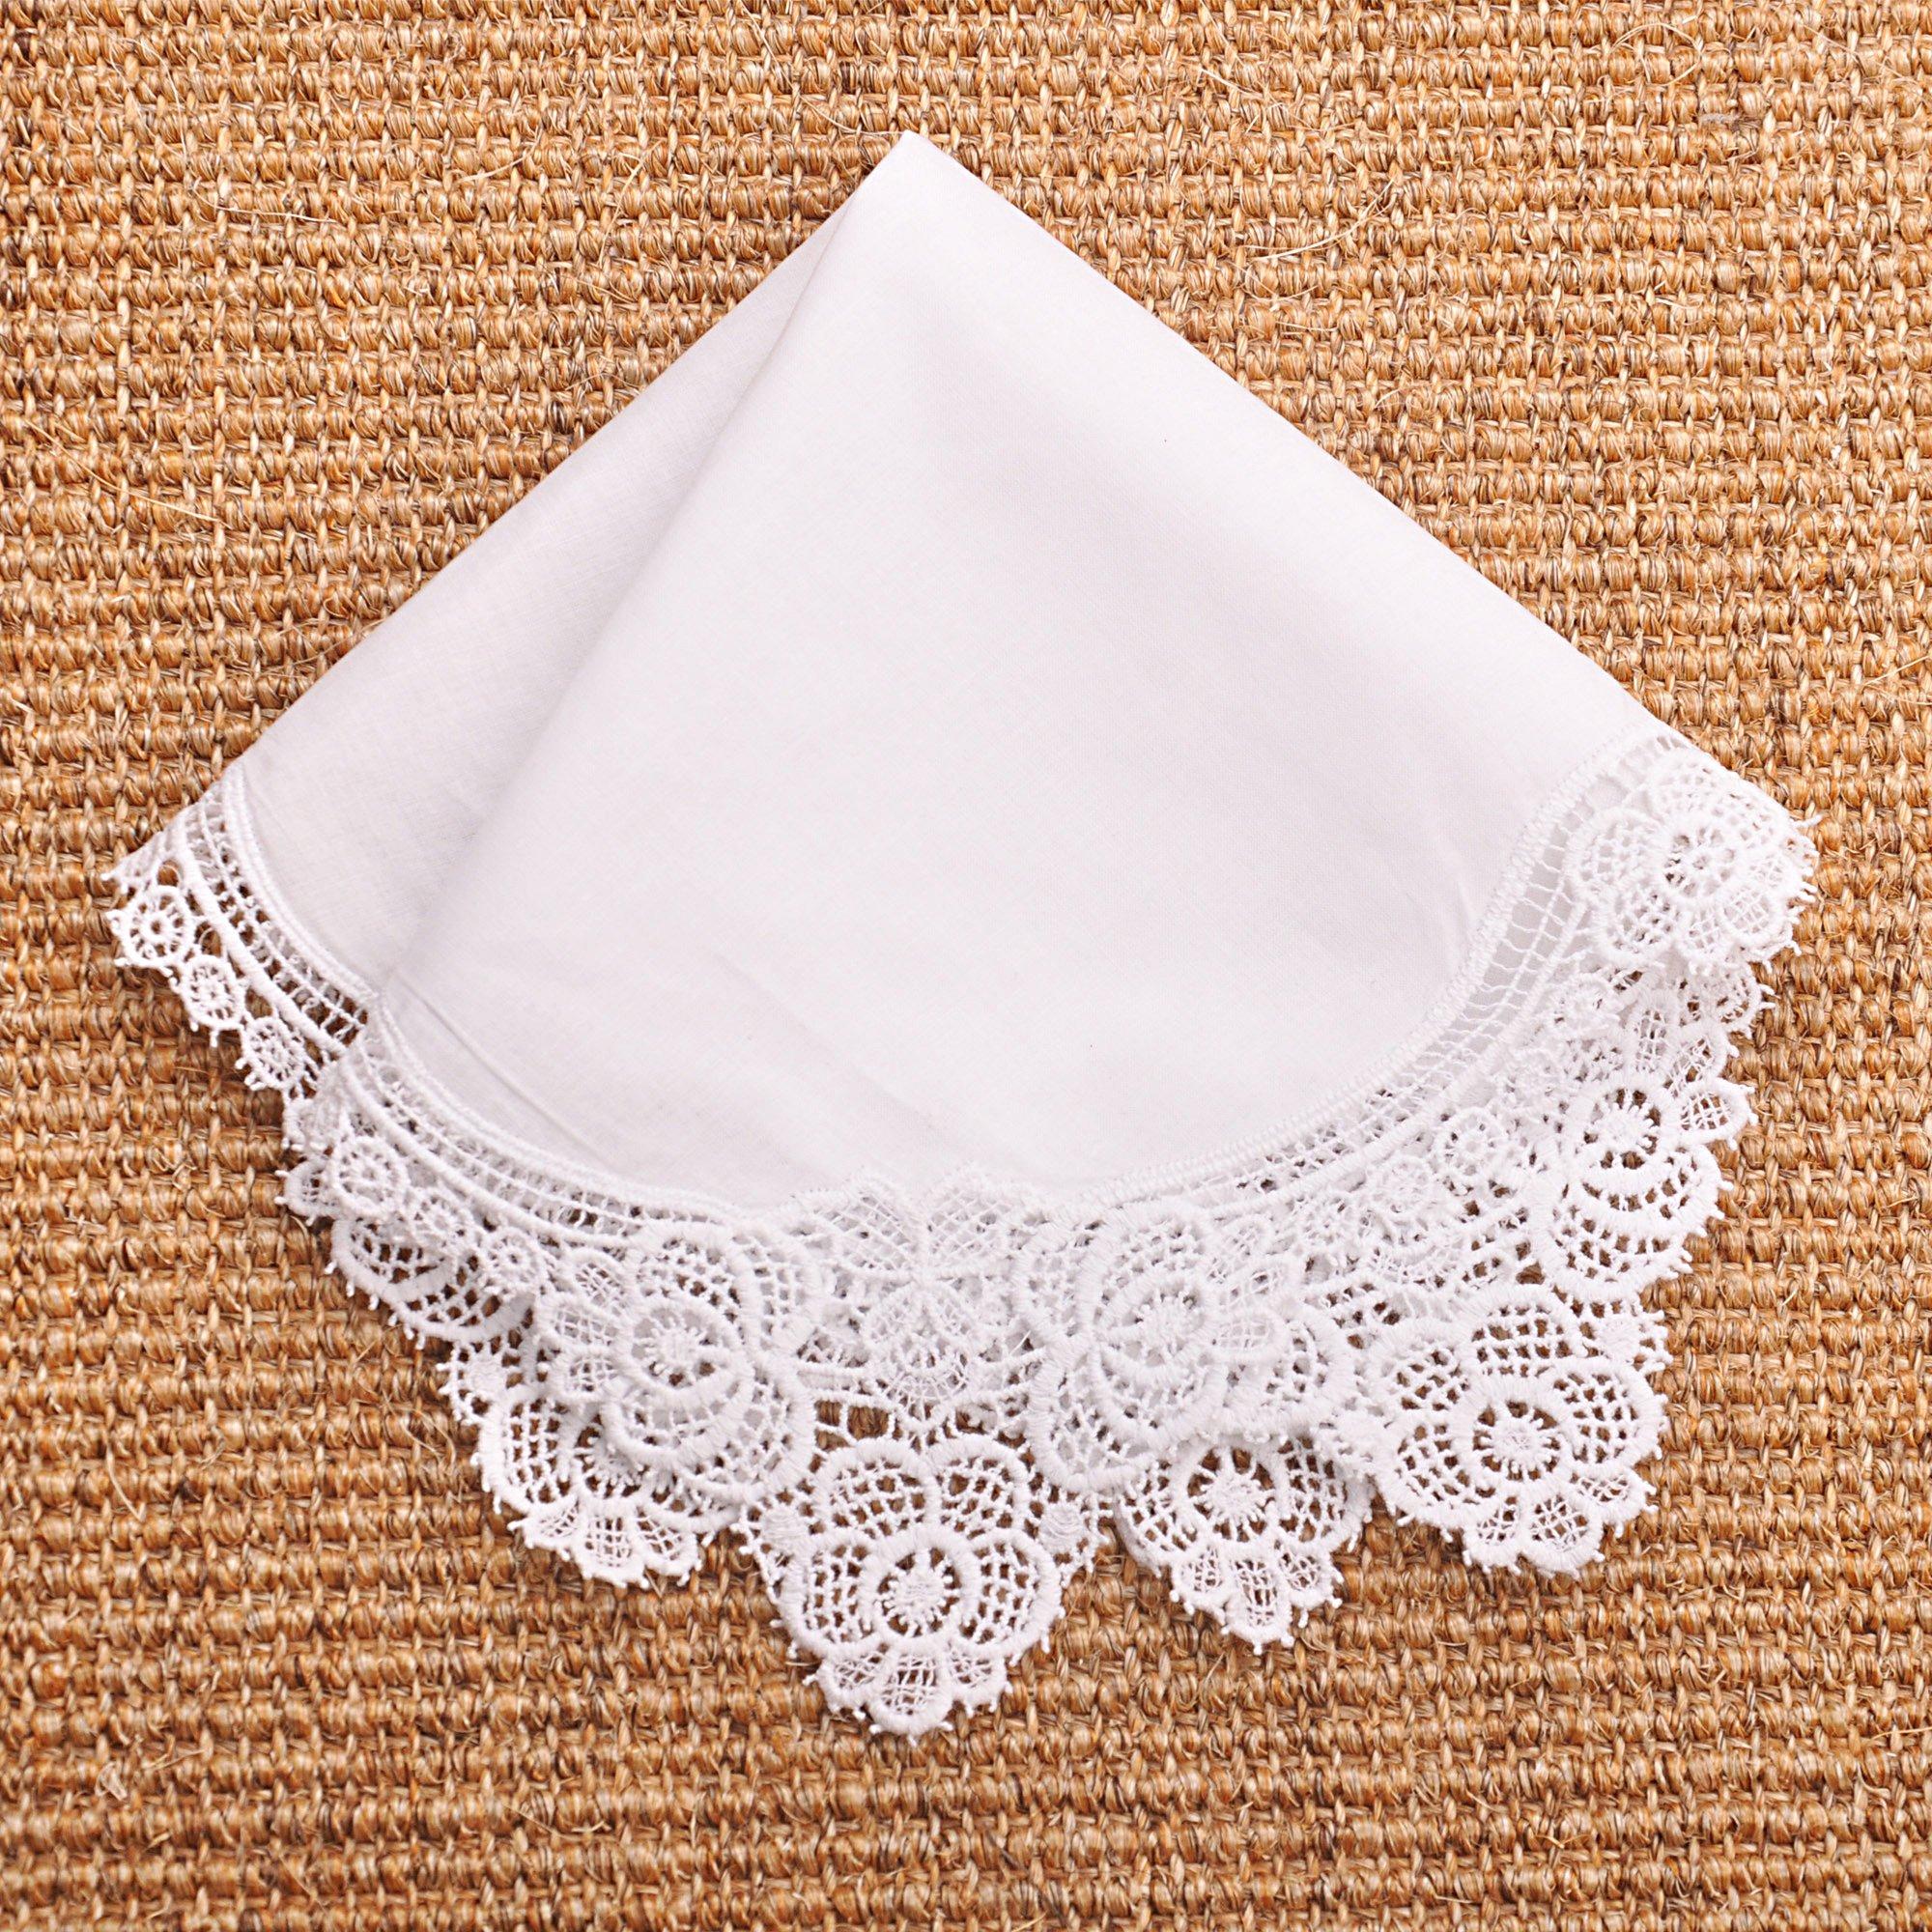 Milesky Bridal Wedding Crochet Lace Handkerchief Premium 60S Cotton CH02 by Milesky (Image #3)